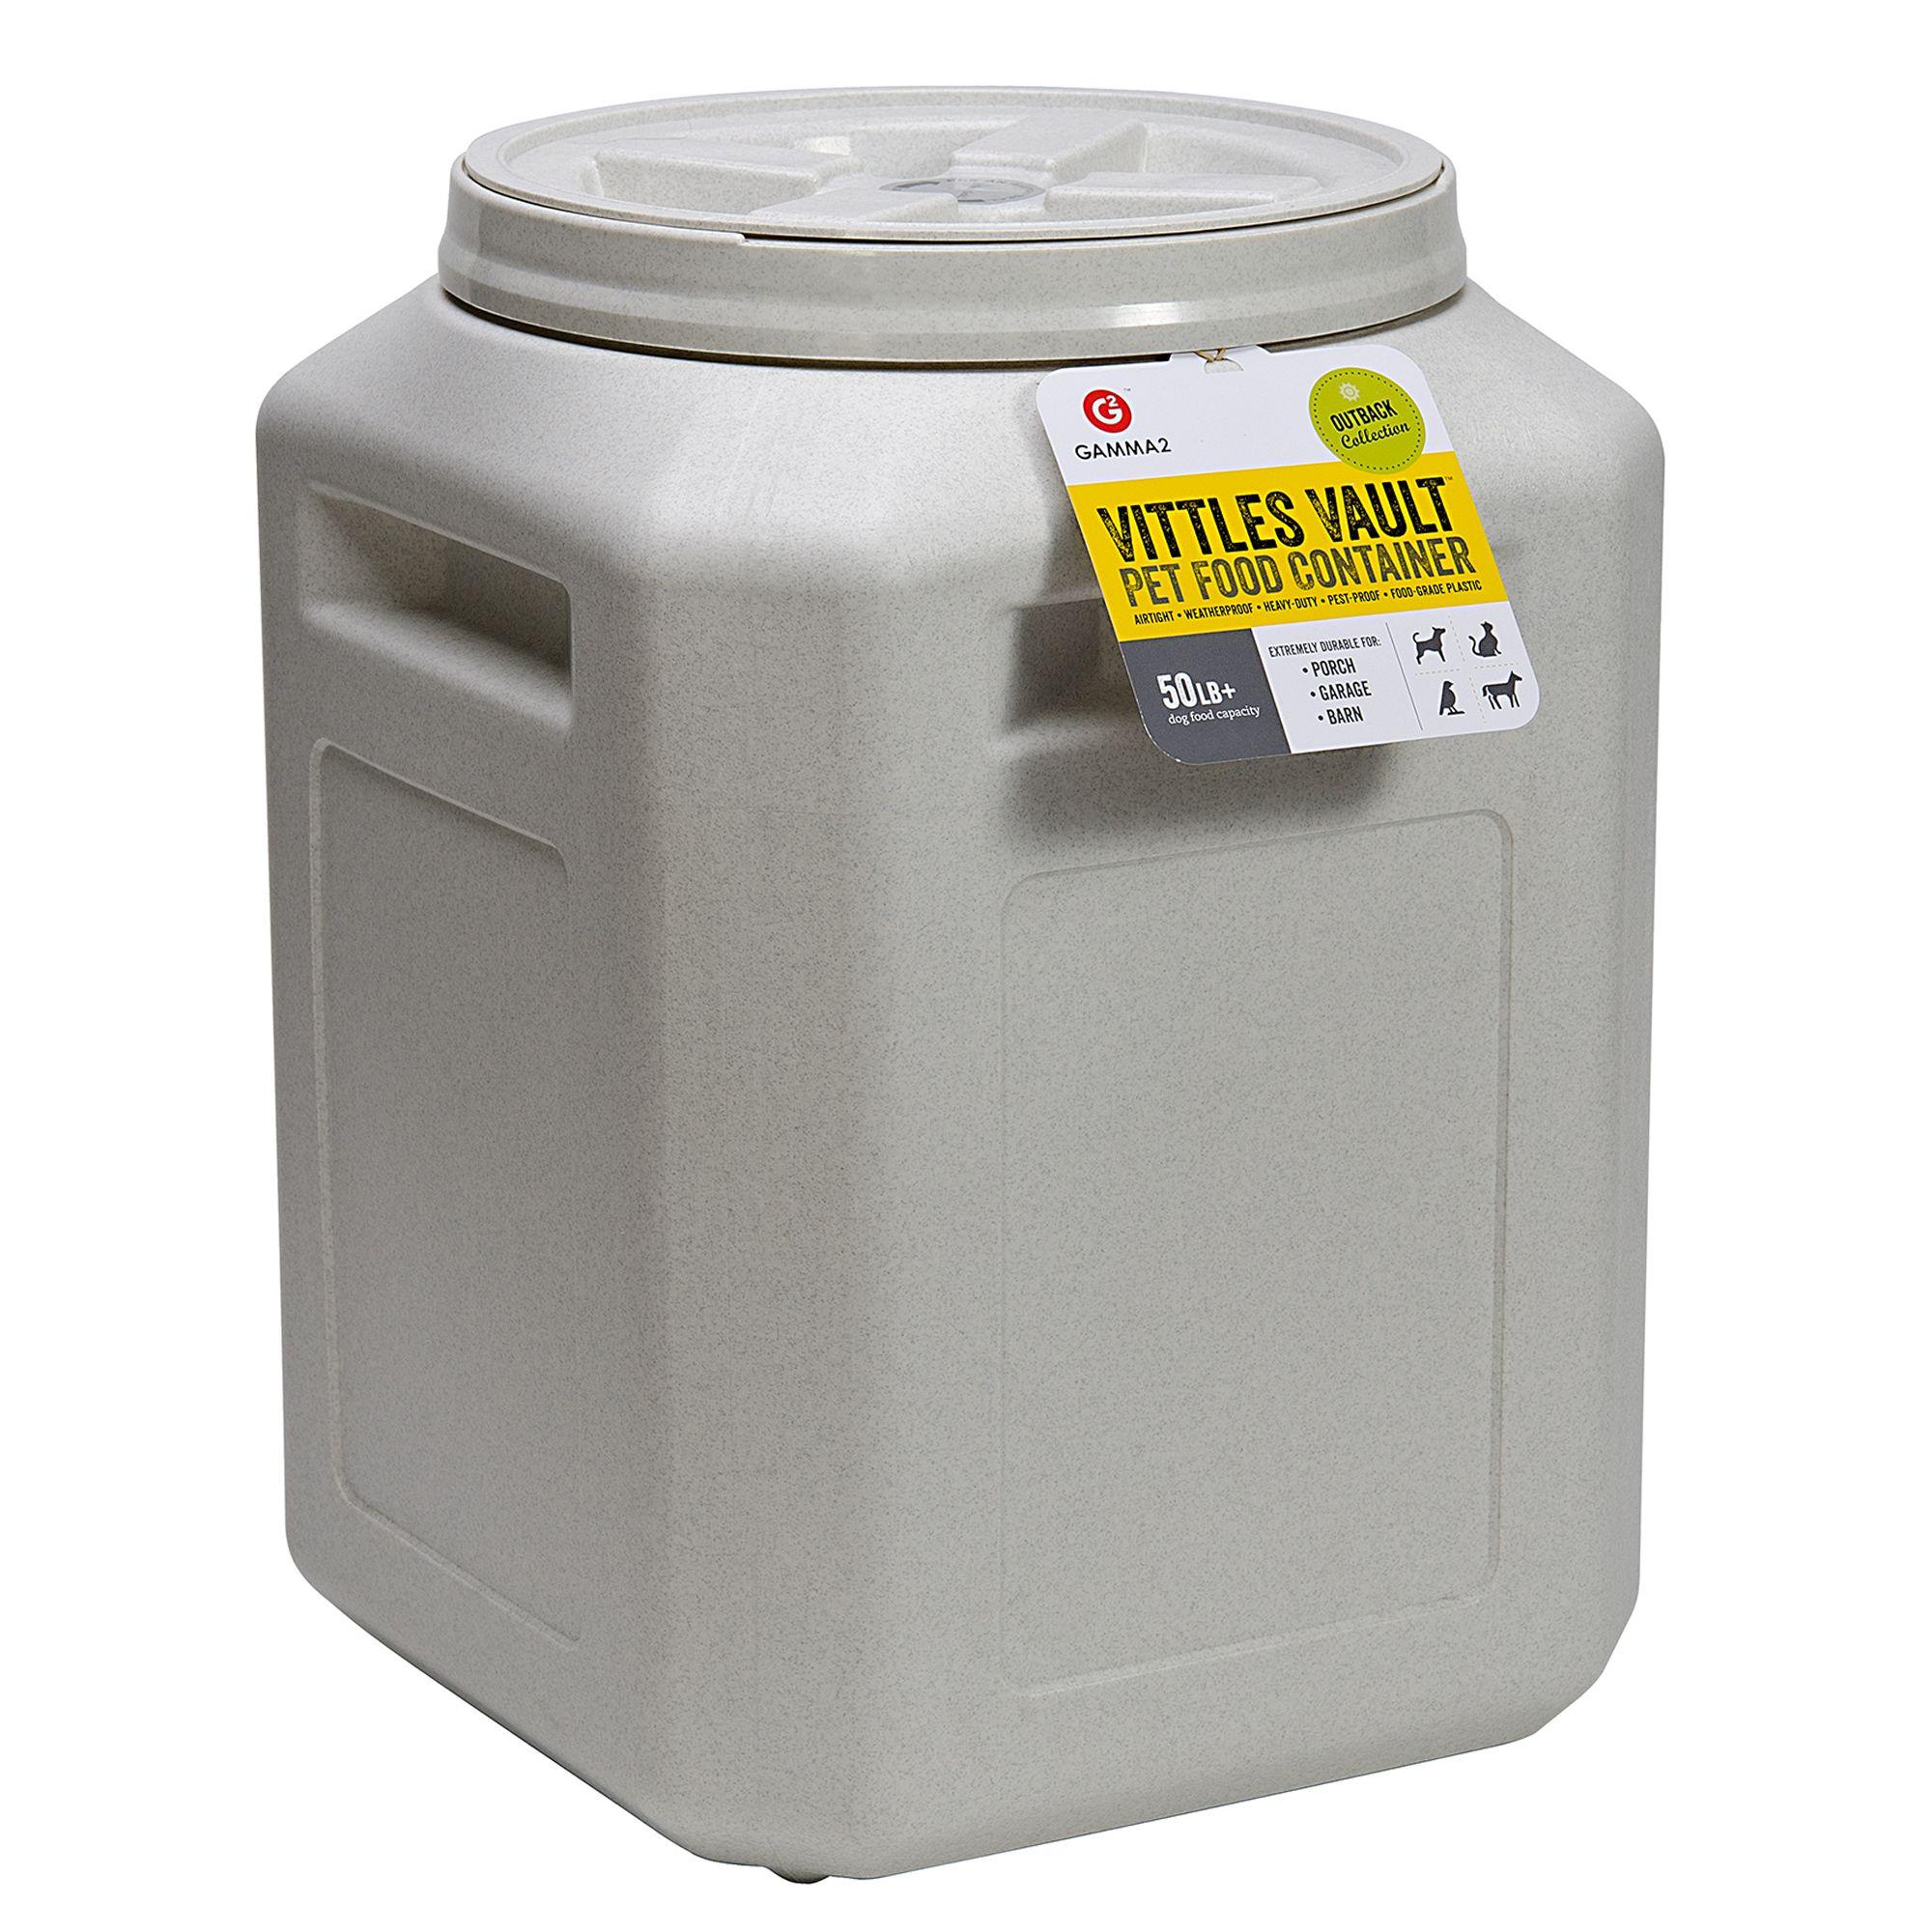 Vittle Vault Pet Food Container Size 50 Lb White